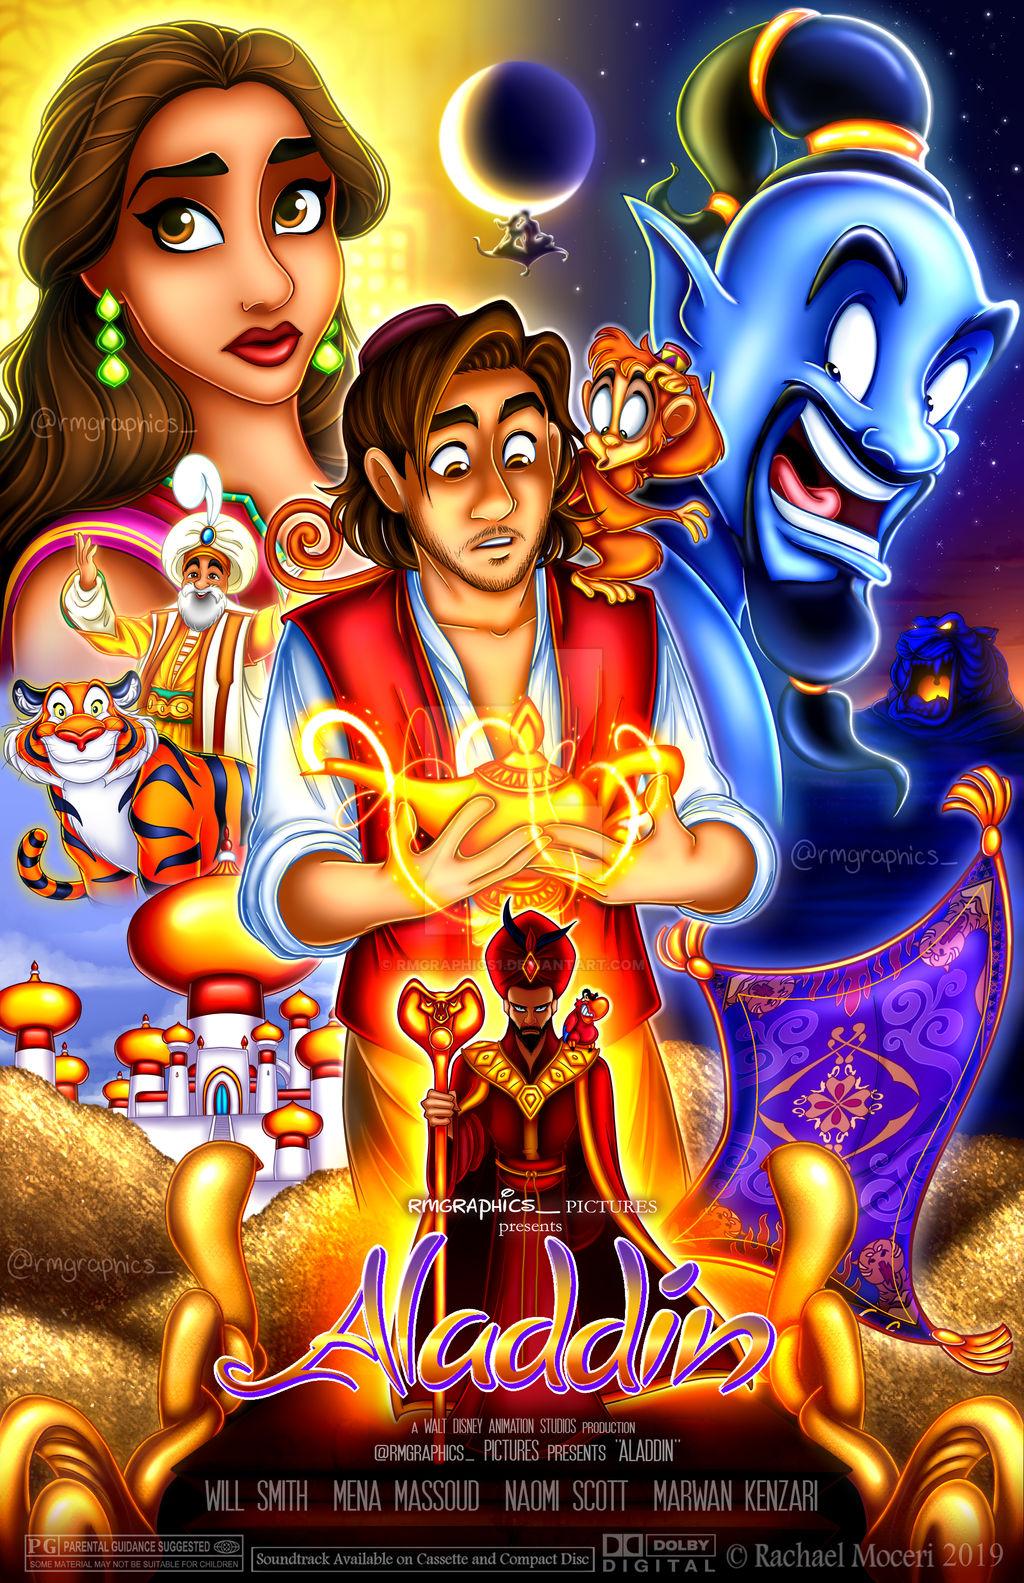 Aladdin 2019 Demake Poster By Rmgraphics1 On Deviantart